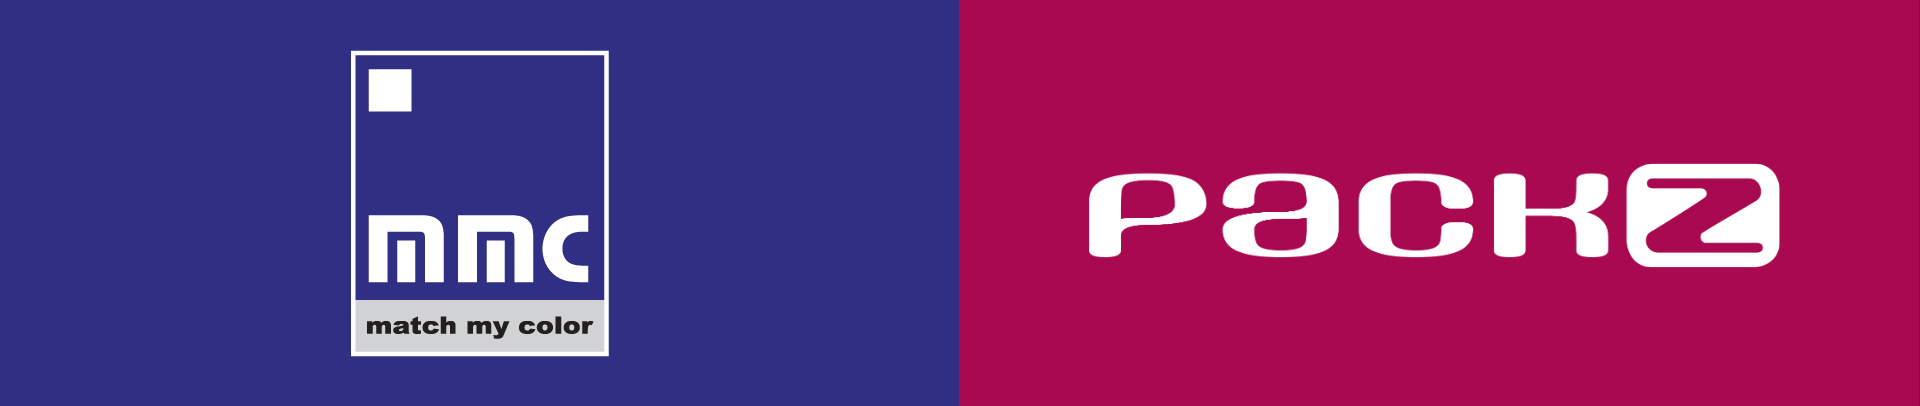 packz-mmc-logos-images.jpg